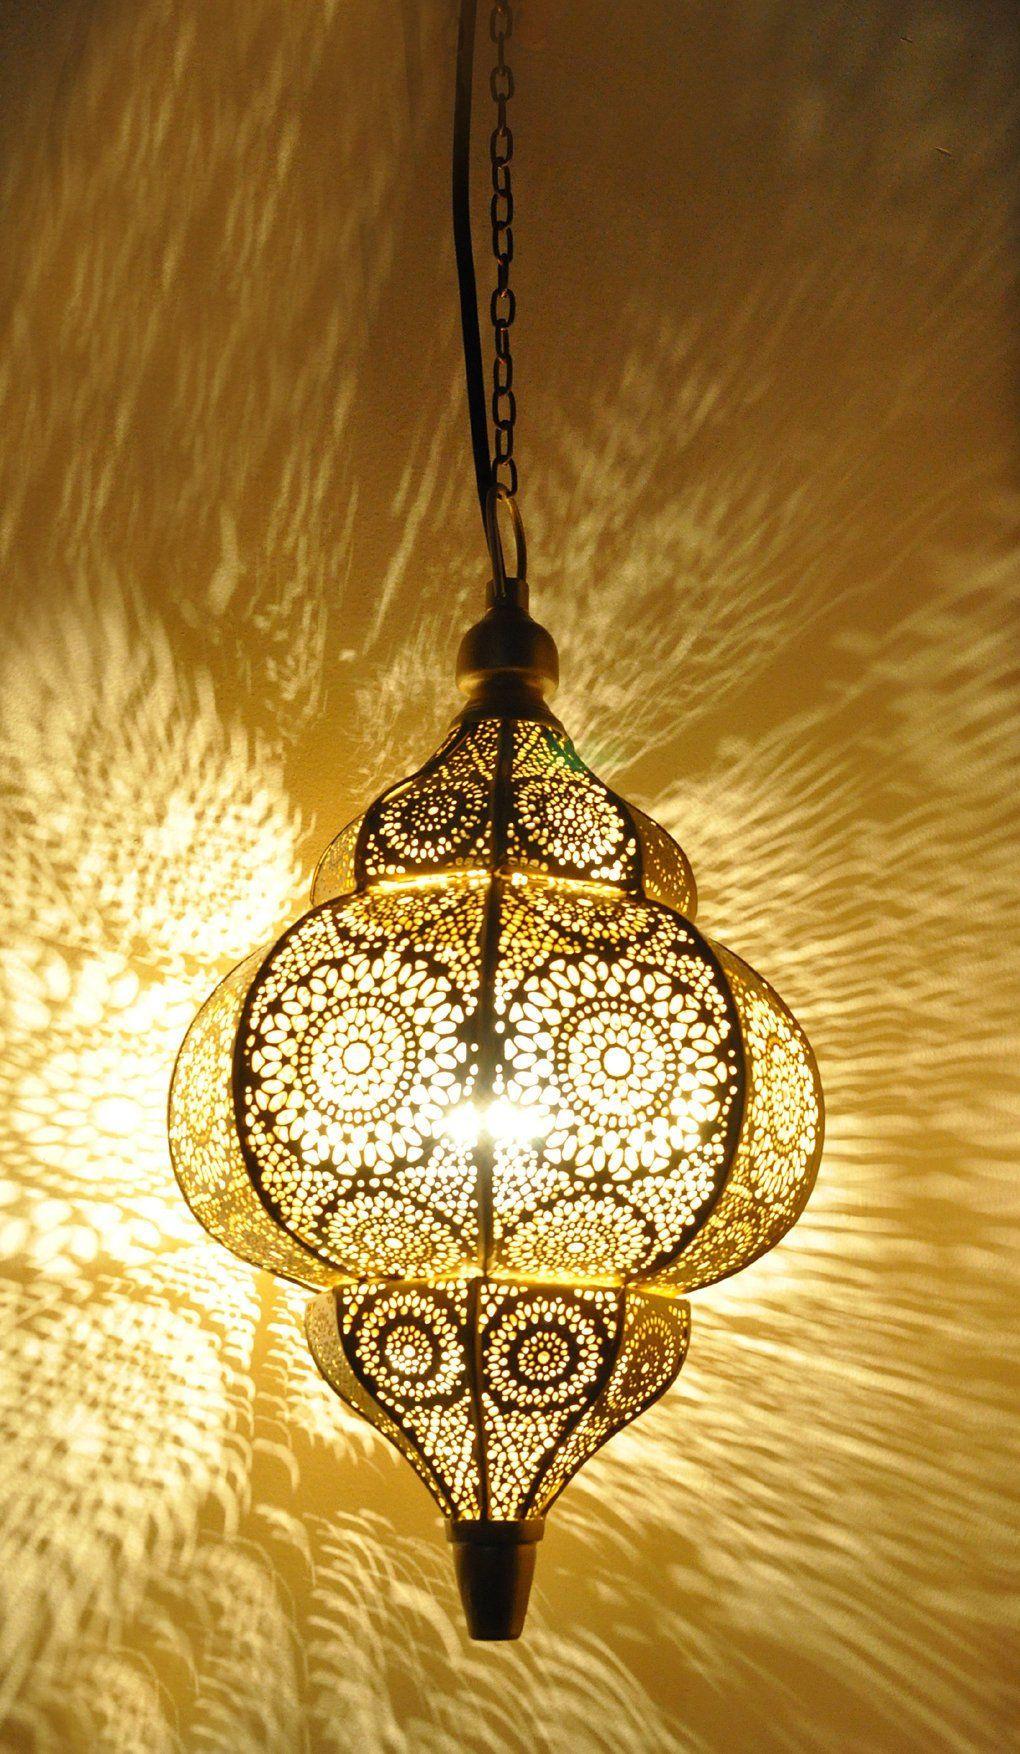 Turkish Metal Ceiling Lamp Golden Color Pendant Night Light Moroccan Lantern House Wedding Gifts And Decor B Moroccan Pendant Light Moroccan Lamp Home Lanterns